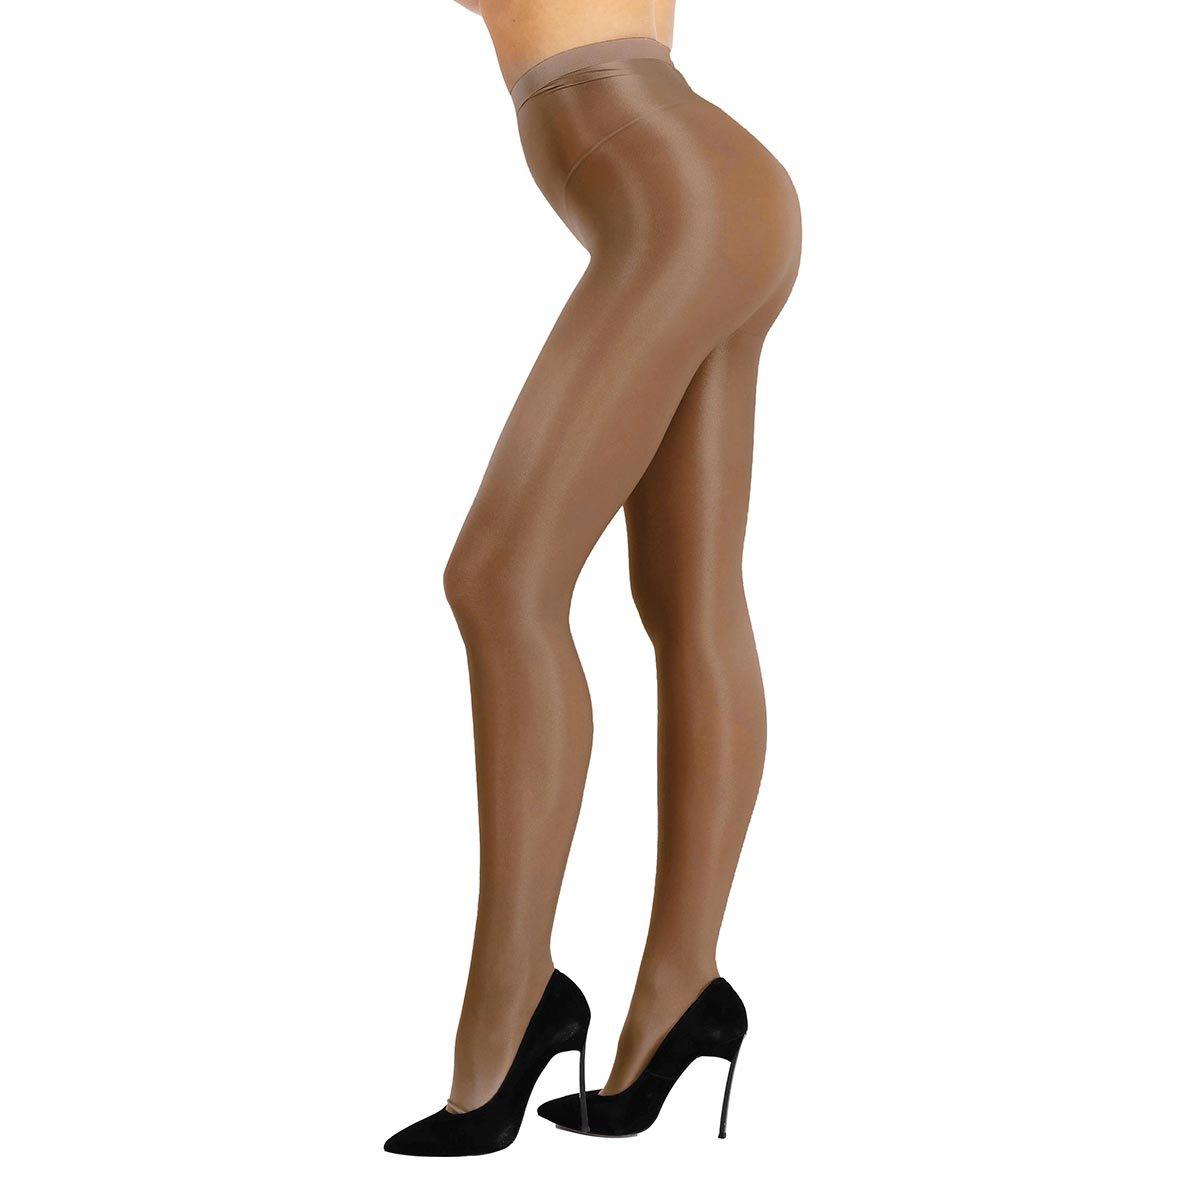 TiaoBug Femme Collant Brillant Legging Collant de Danse Bal Club Respirant  Collant Bas de Yoga Ballet Collant de Pole Danse Legging Café Taille  Unique  ... c8adce95b953